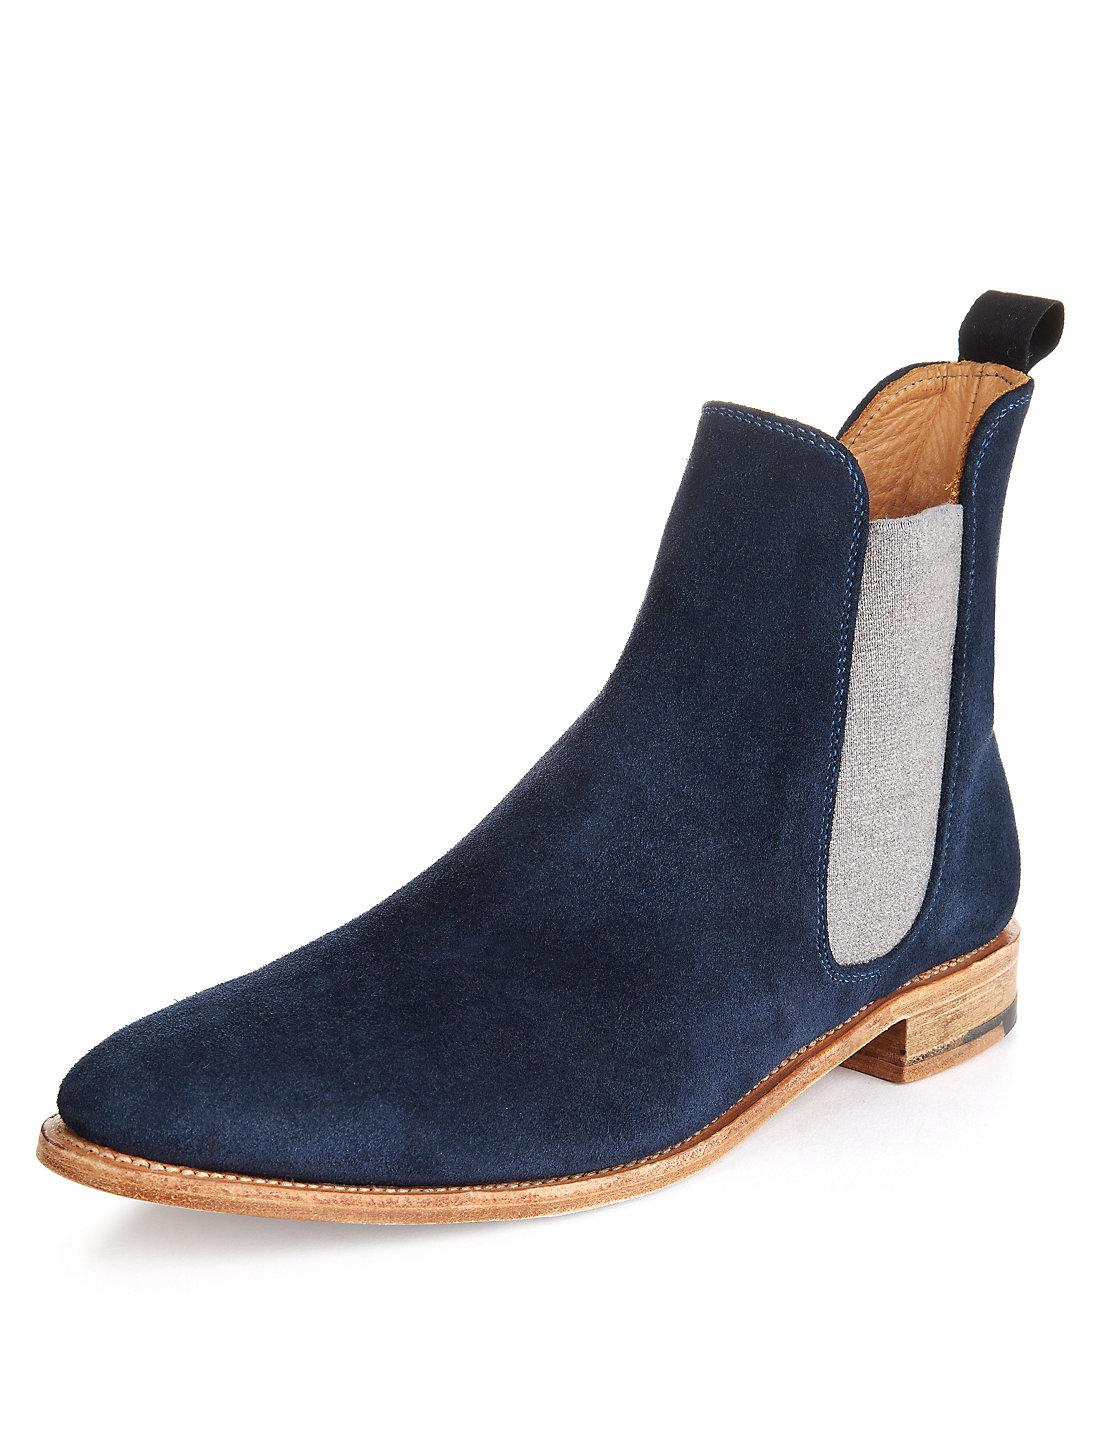 98c6b031e1 Handmade mens chelsea boots, Men Fashion blue ankle-high suede ...